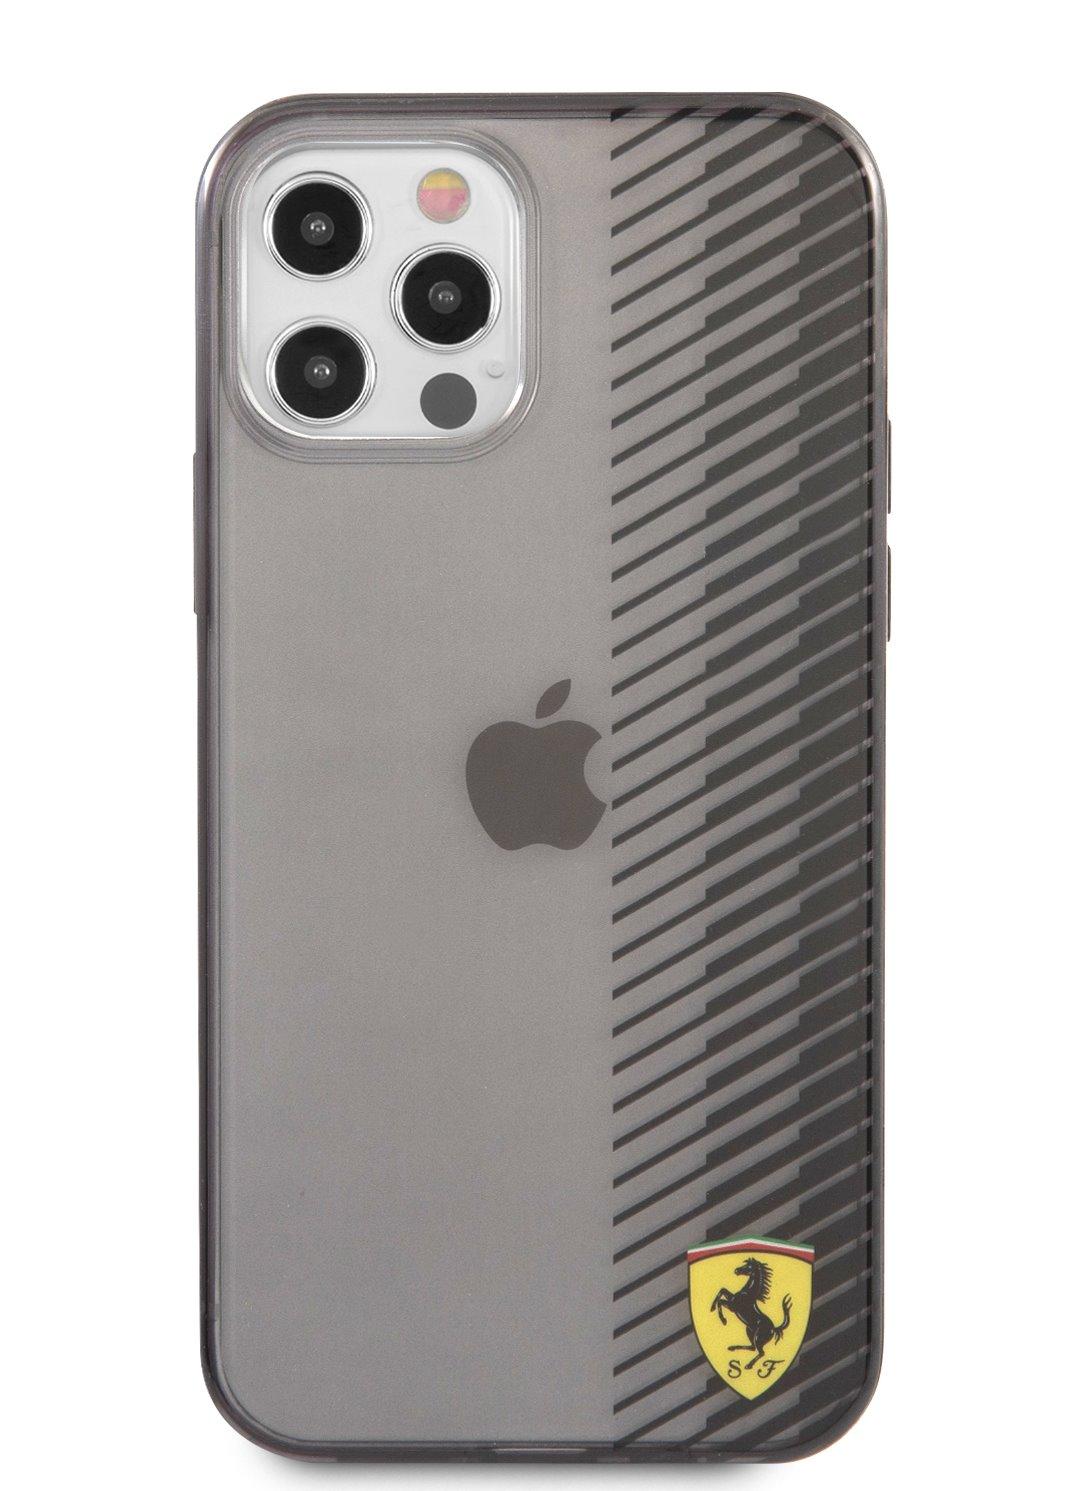 FEHCP12LUYEK Ferrari On Track Gradient Kryt pro iPhone 12 Pro Max 6.7 Black 3666339017040